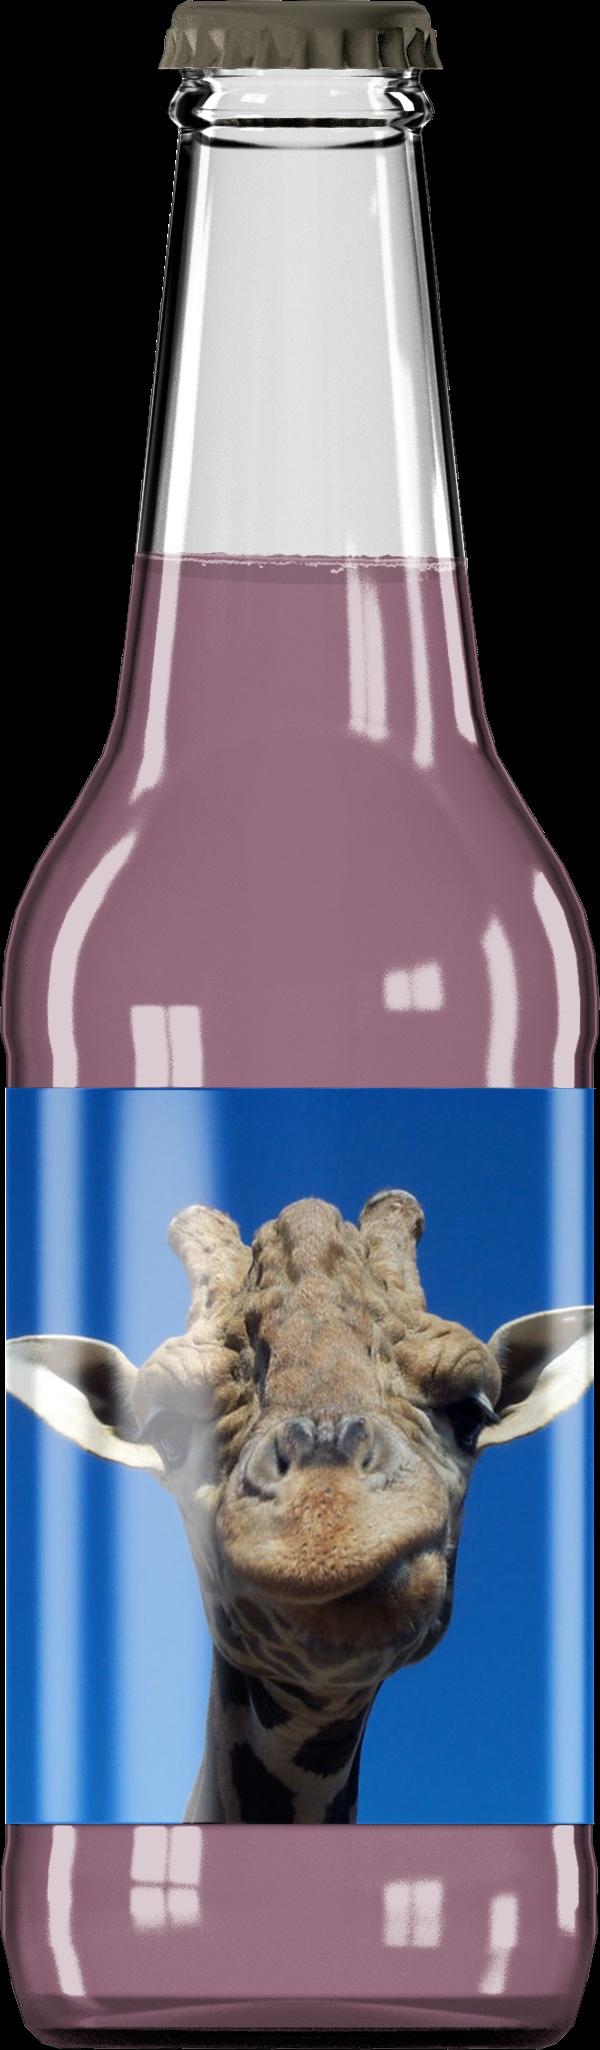 Soda I created at uFlavor.: Garden, Uflavor, Kick Ass, Products, Giraffes